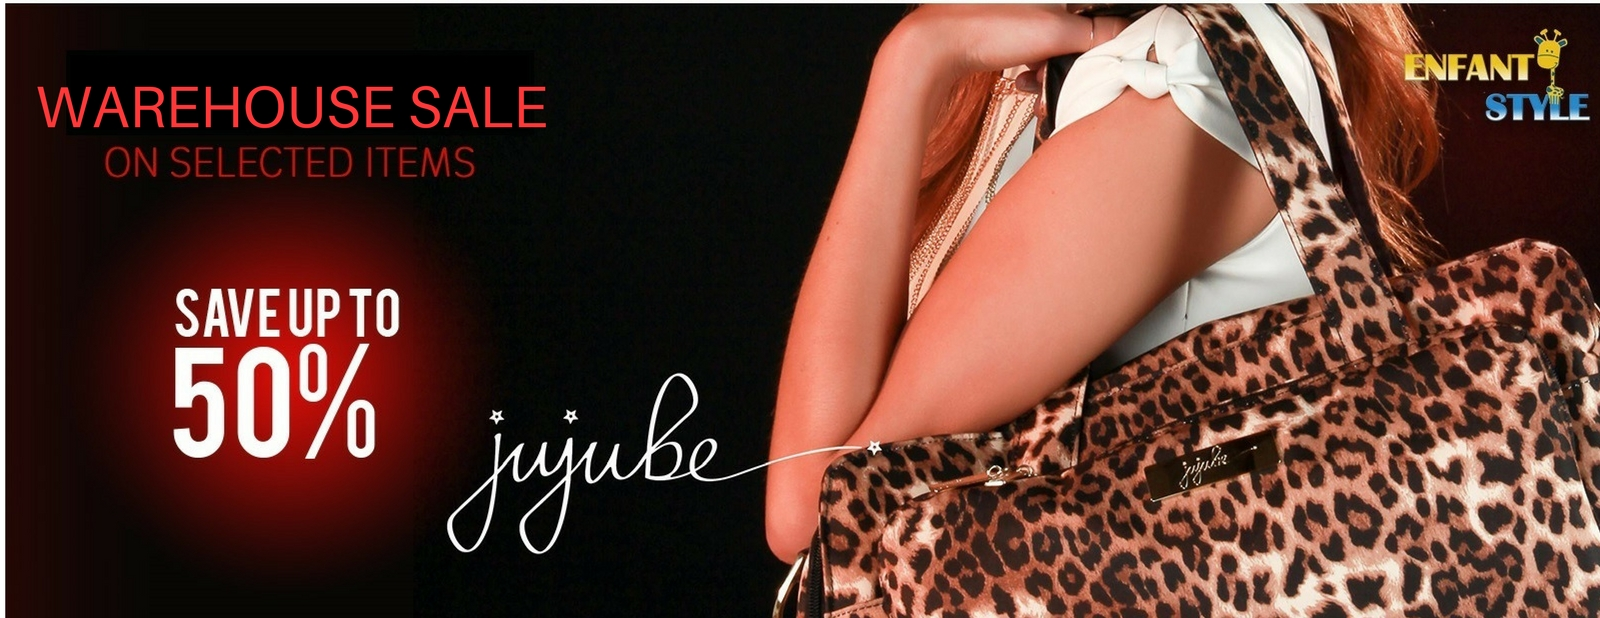 jujube warehouse sale at Enfant Style